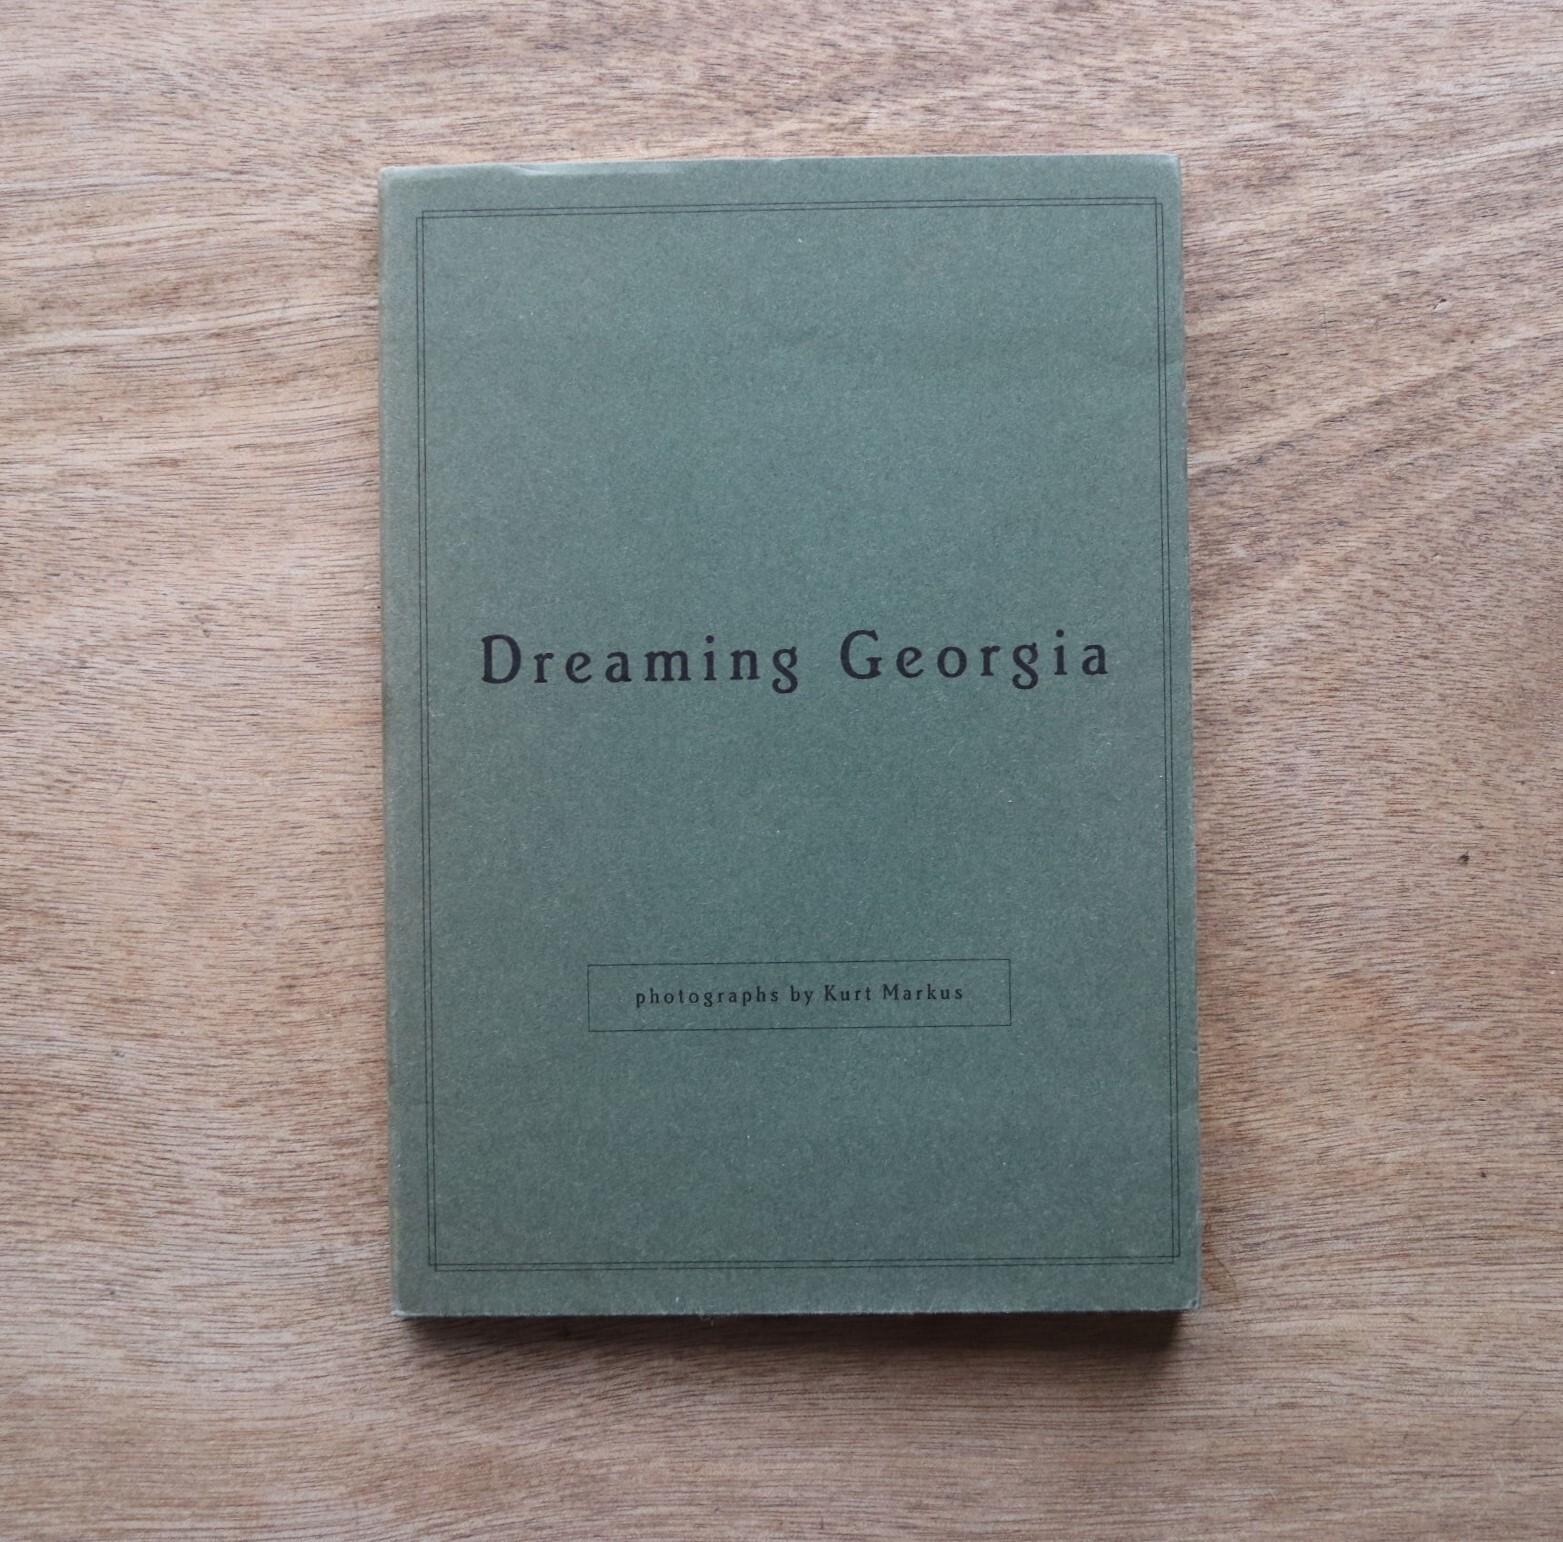 Dreaming Georgia カート・マーカス 写真集 / Kurt Markus